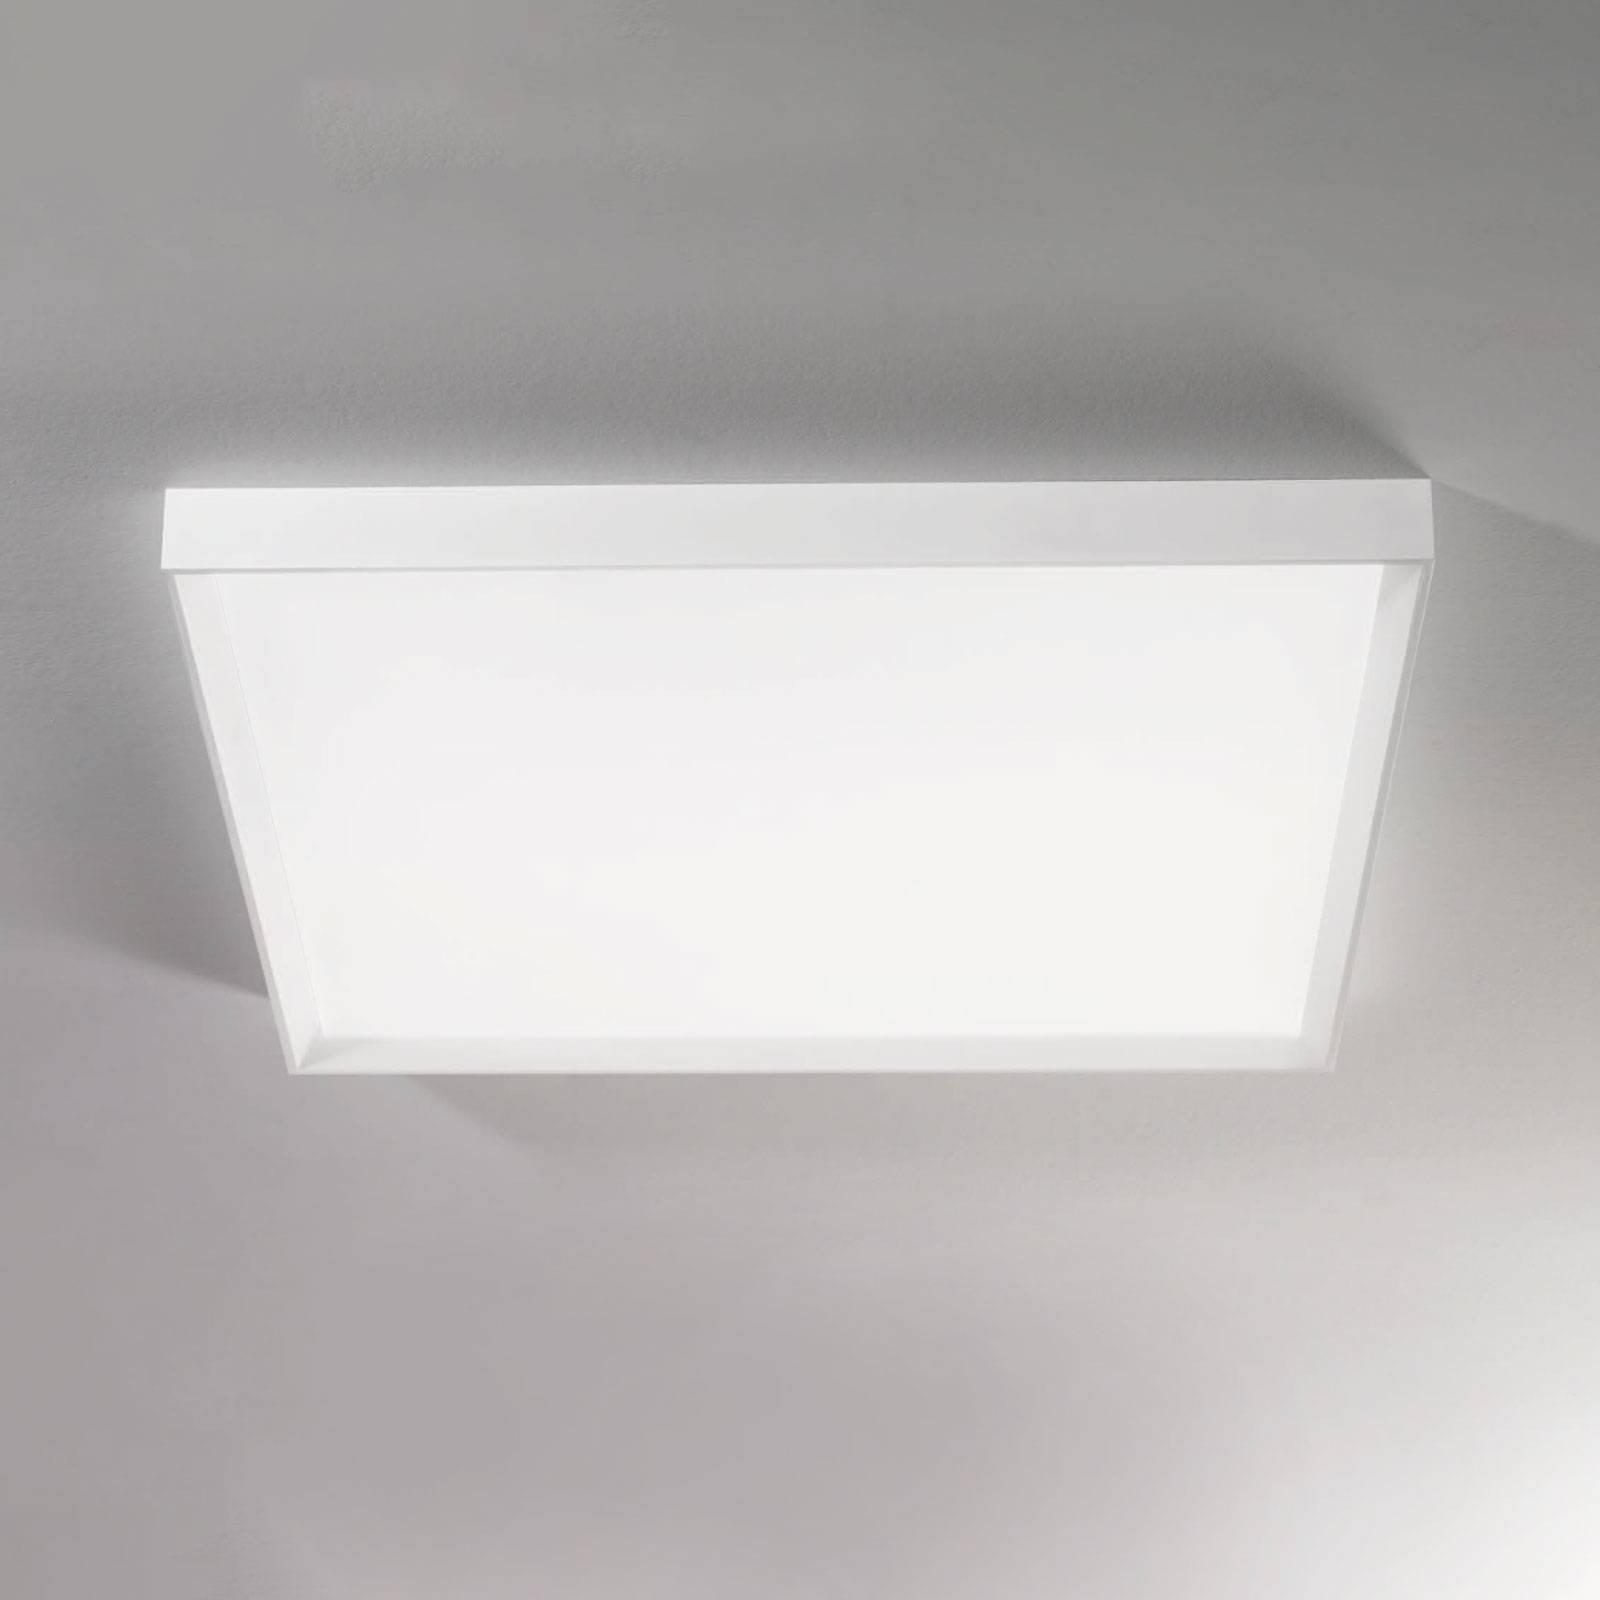 LED-kattovalaisin Tara maxi, 74 cm x 74 cm